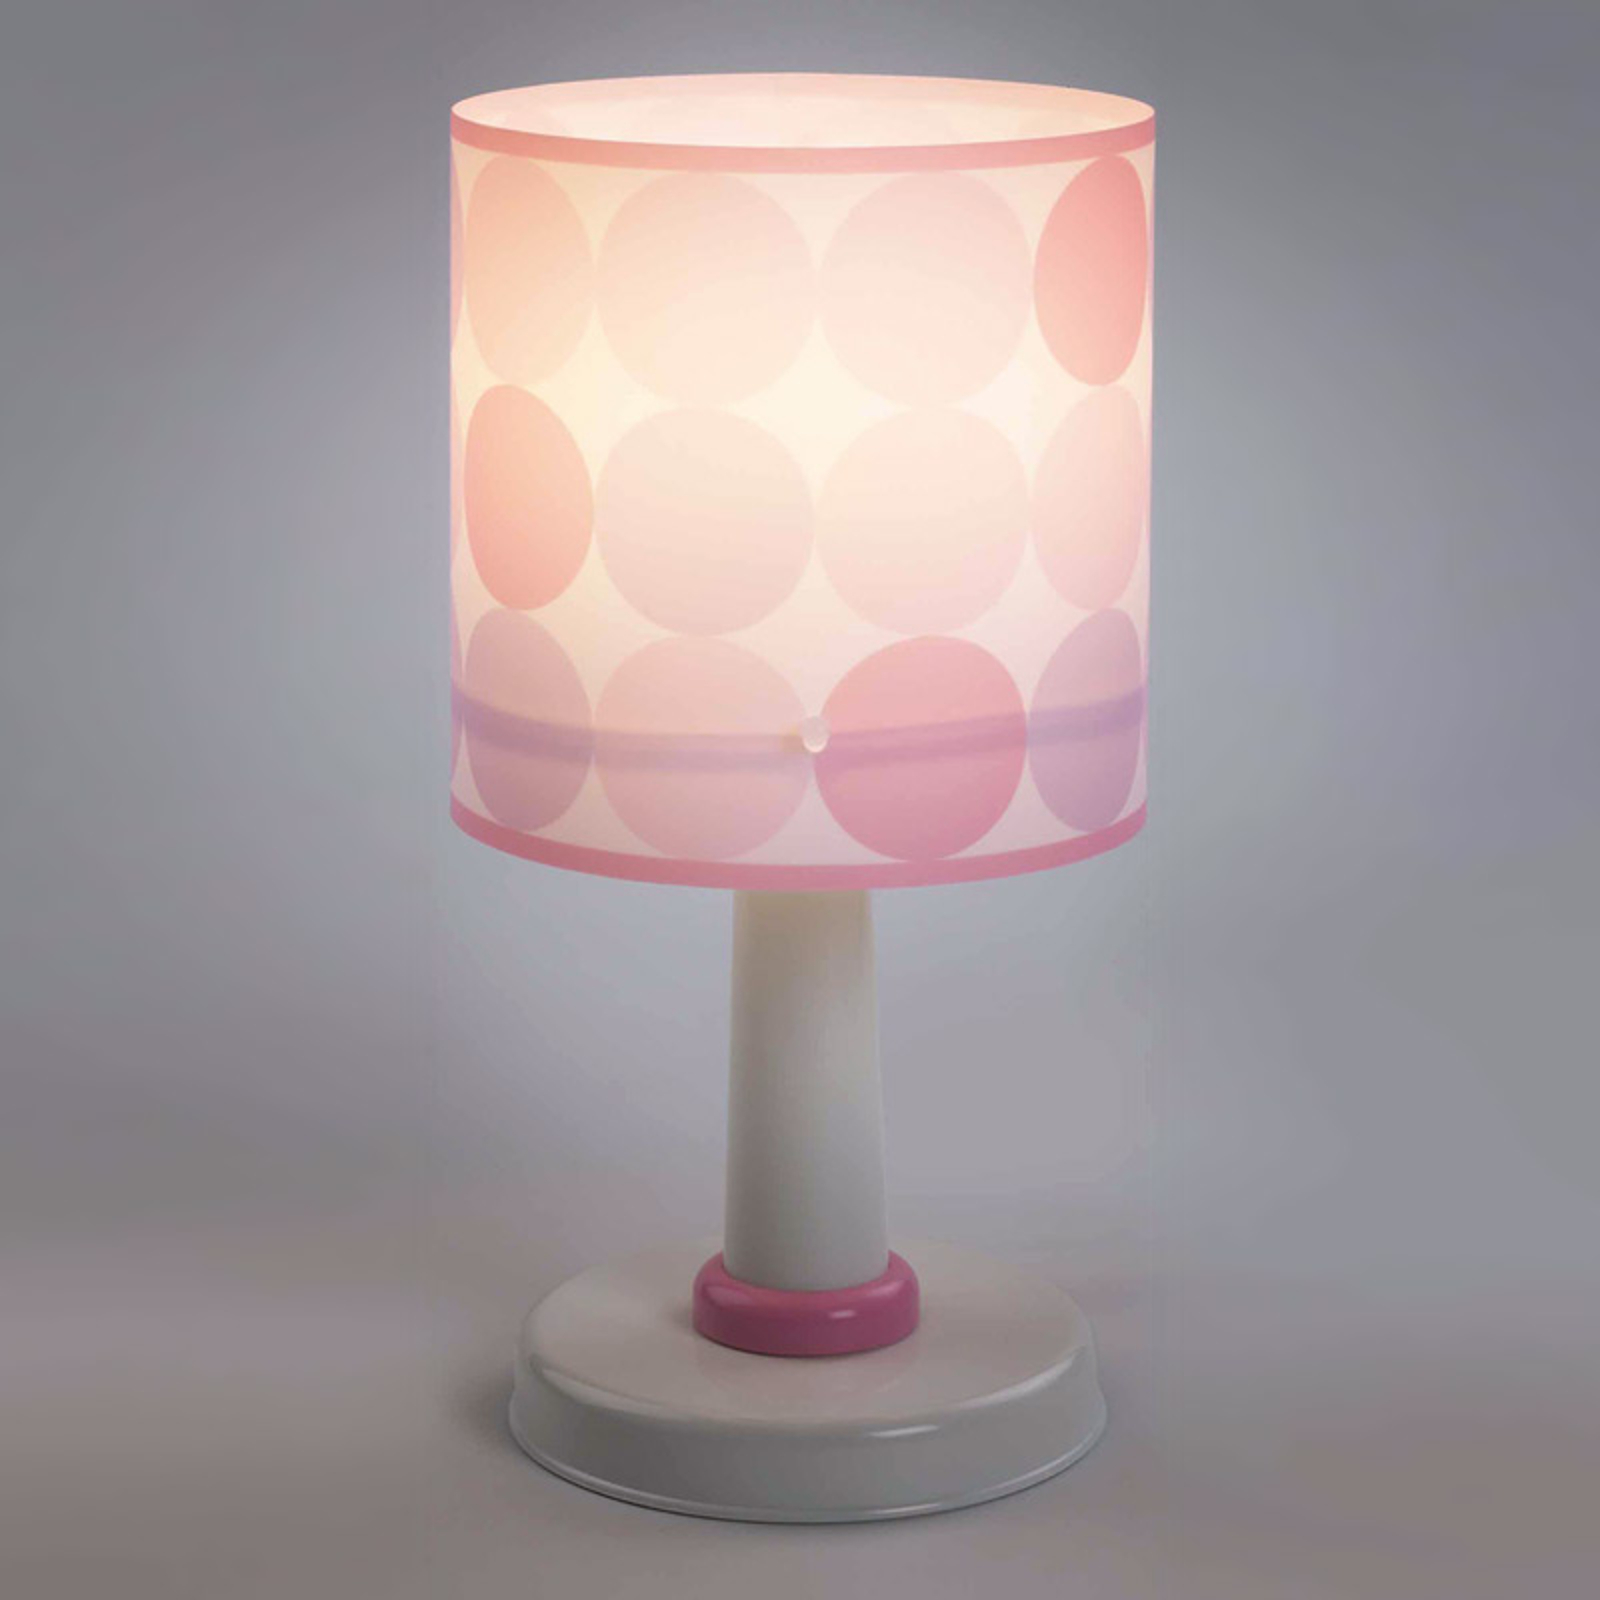 Colors - bordslampa med kretsdesign i rosa